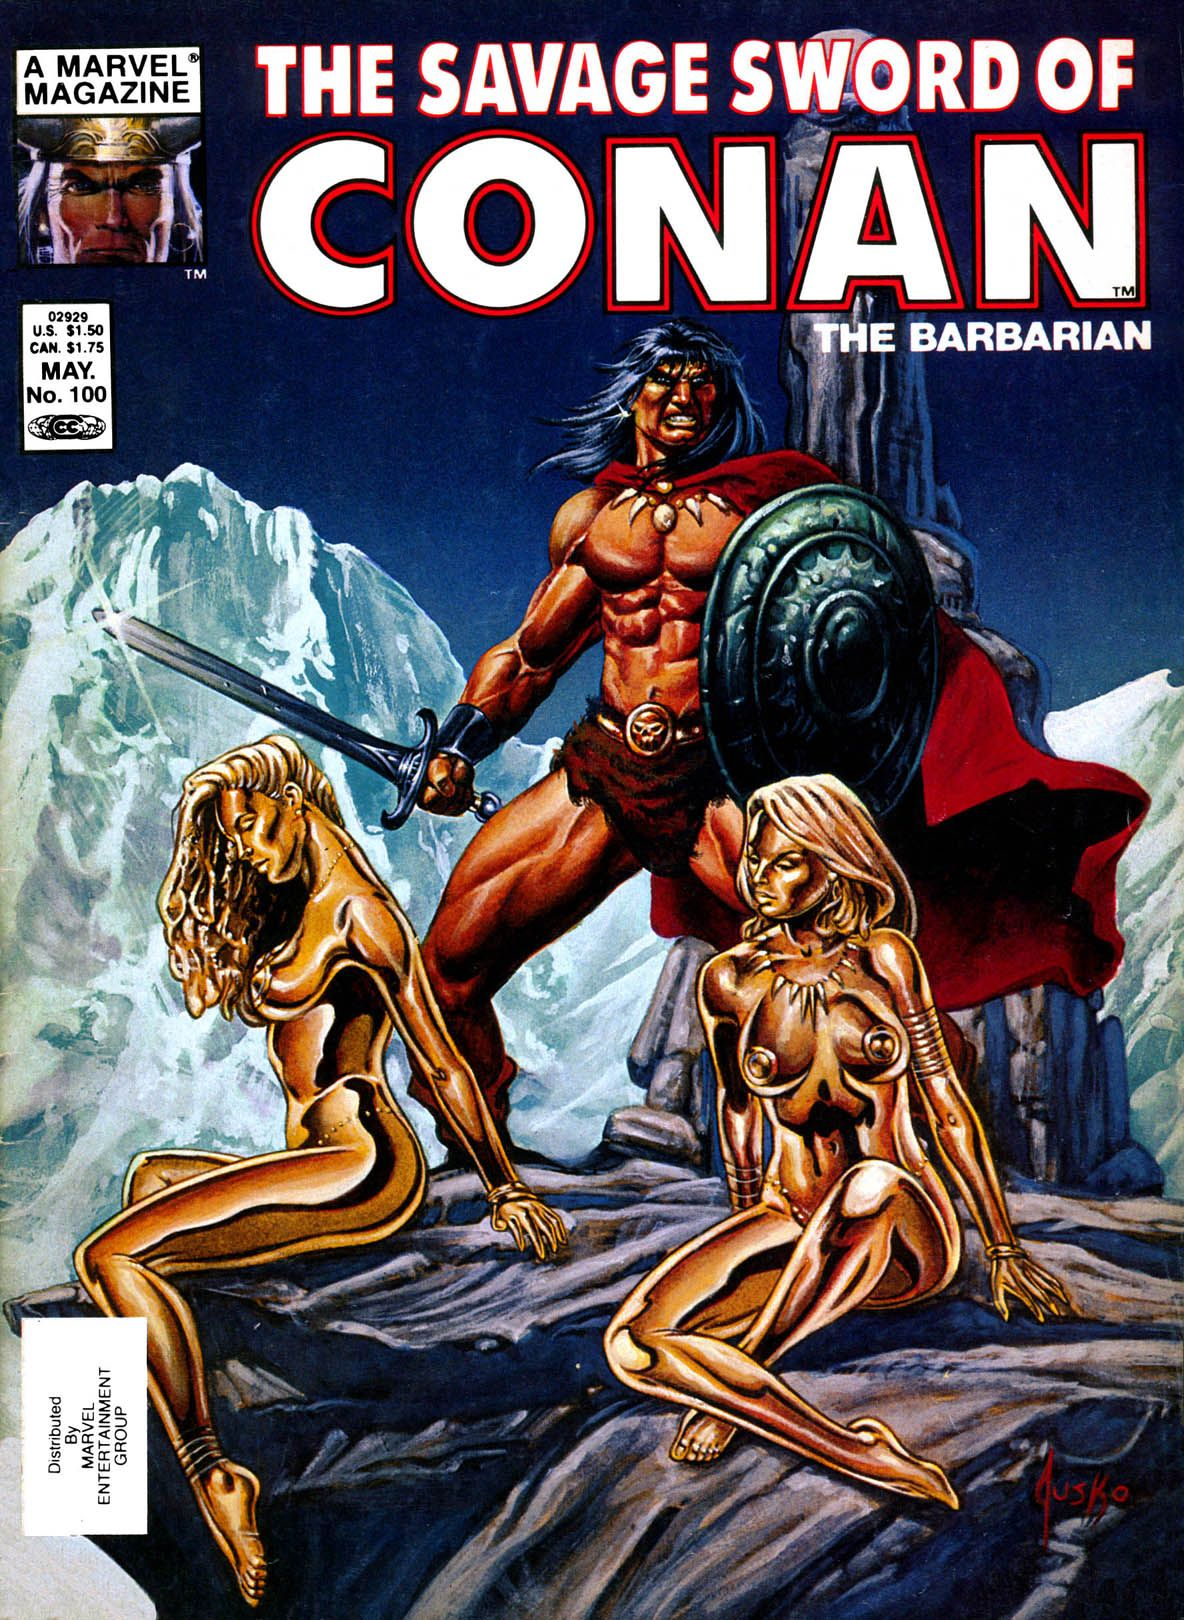 savage sword of conan 2019 covers